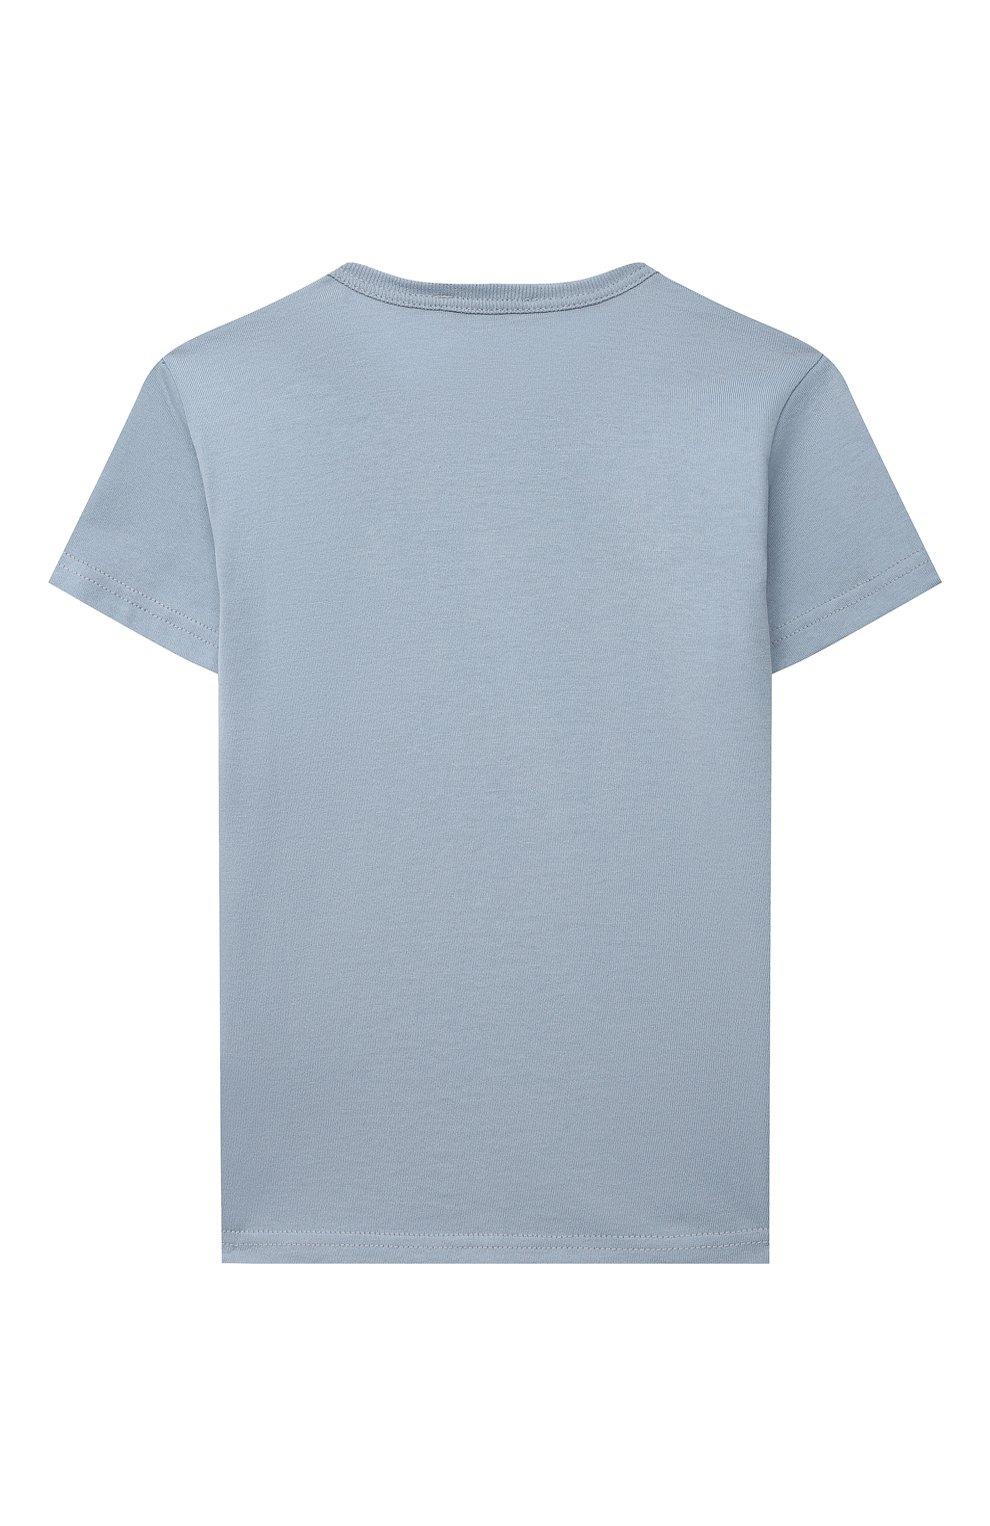 Детский хлопковая футболка DOLCE & GABBANA светло-голубого цвета, арт. L1JT7T/G70LK   Фото 2